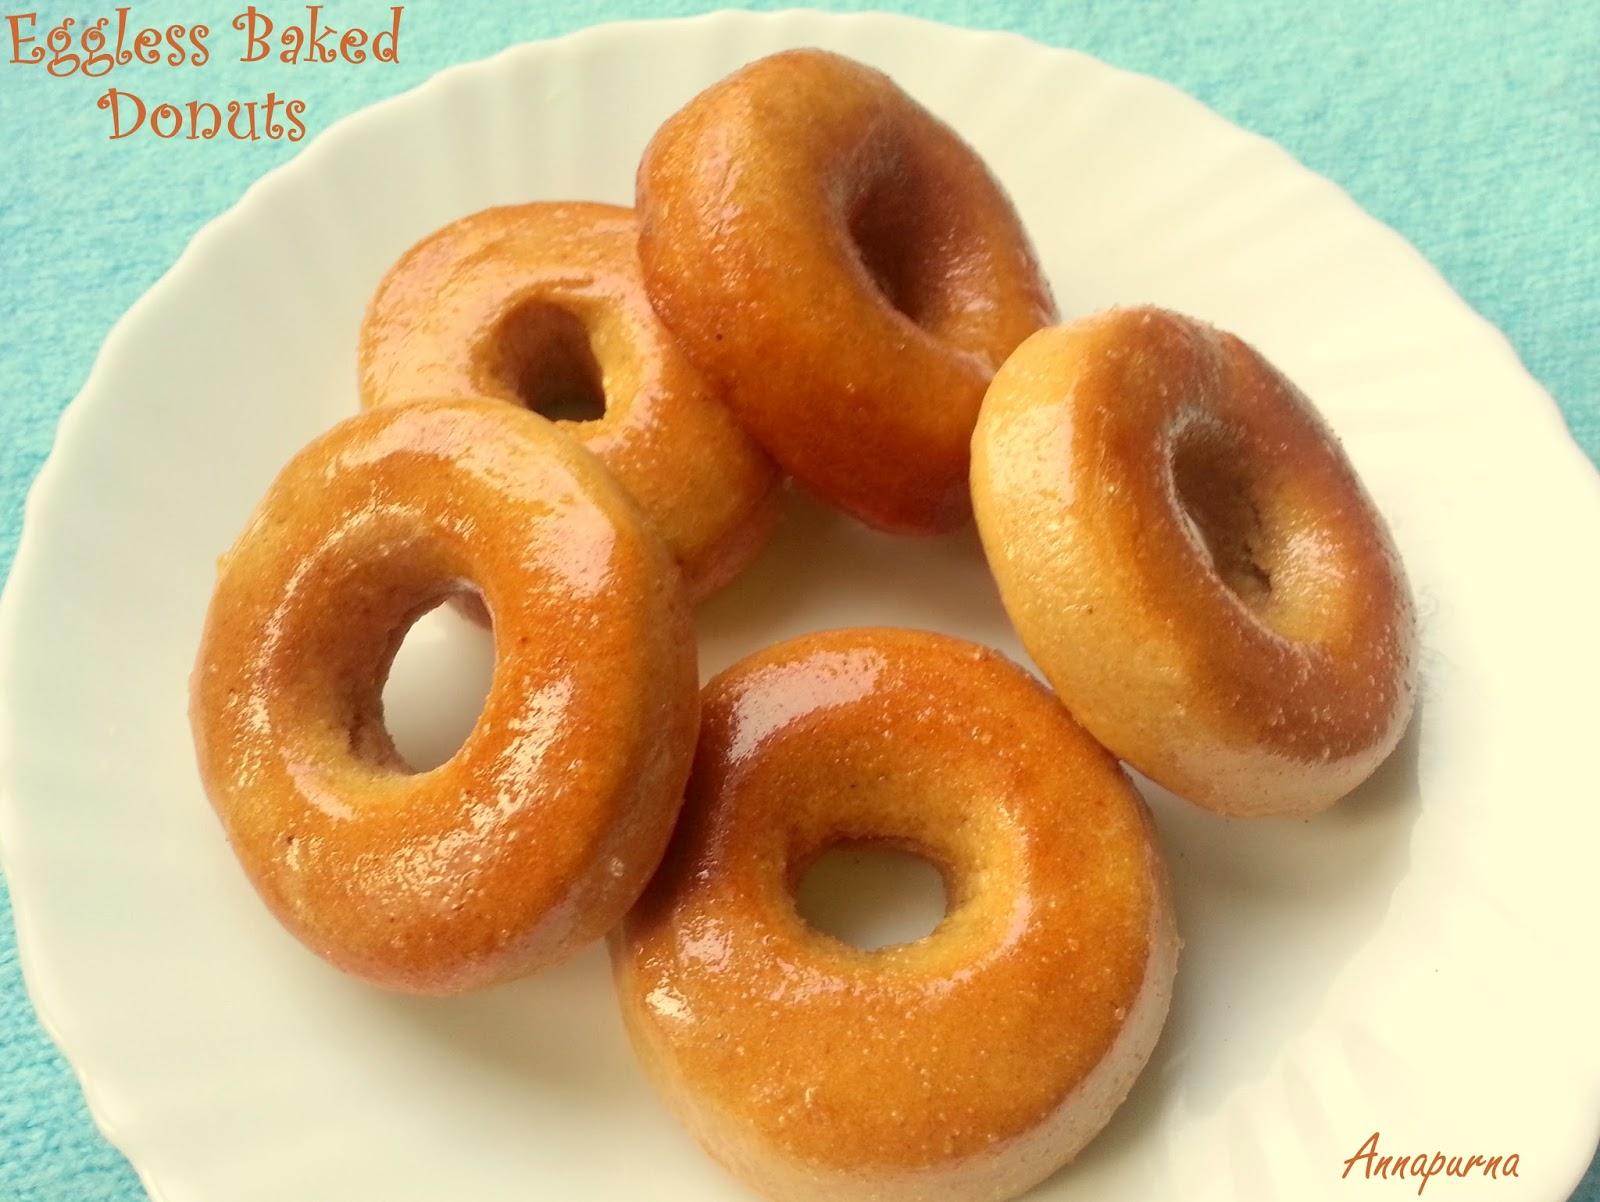 Egg-less Whole Wheat Flour Baked Doughnut Recipe Without Yeast